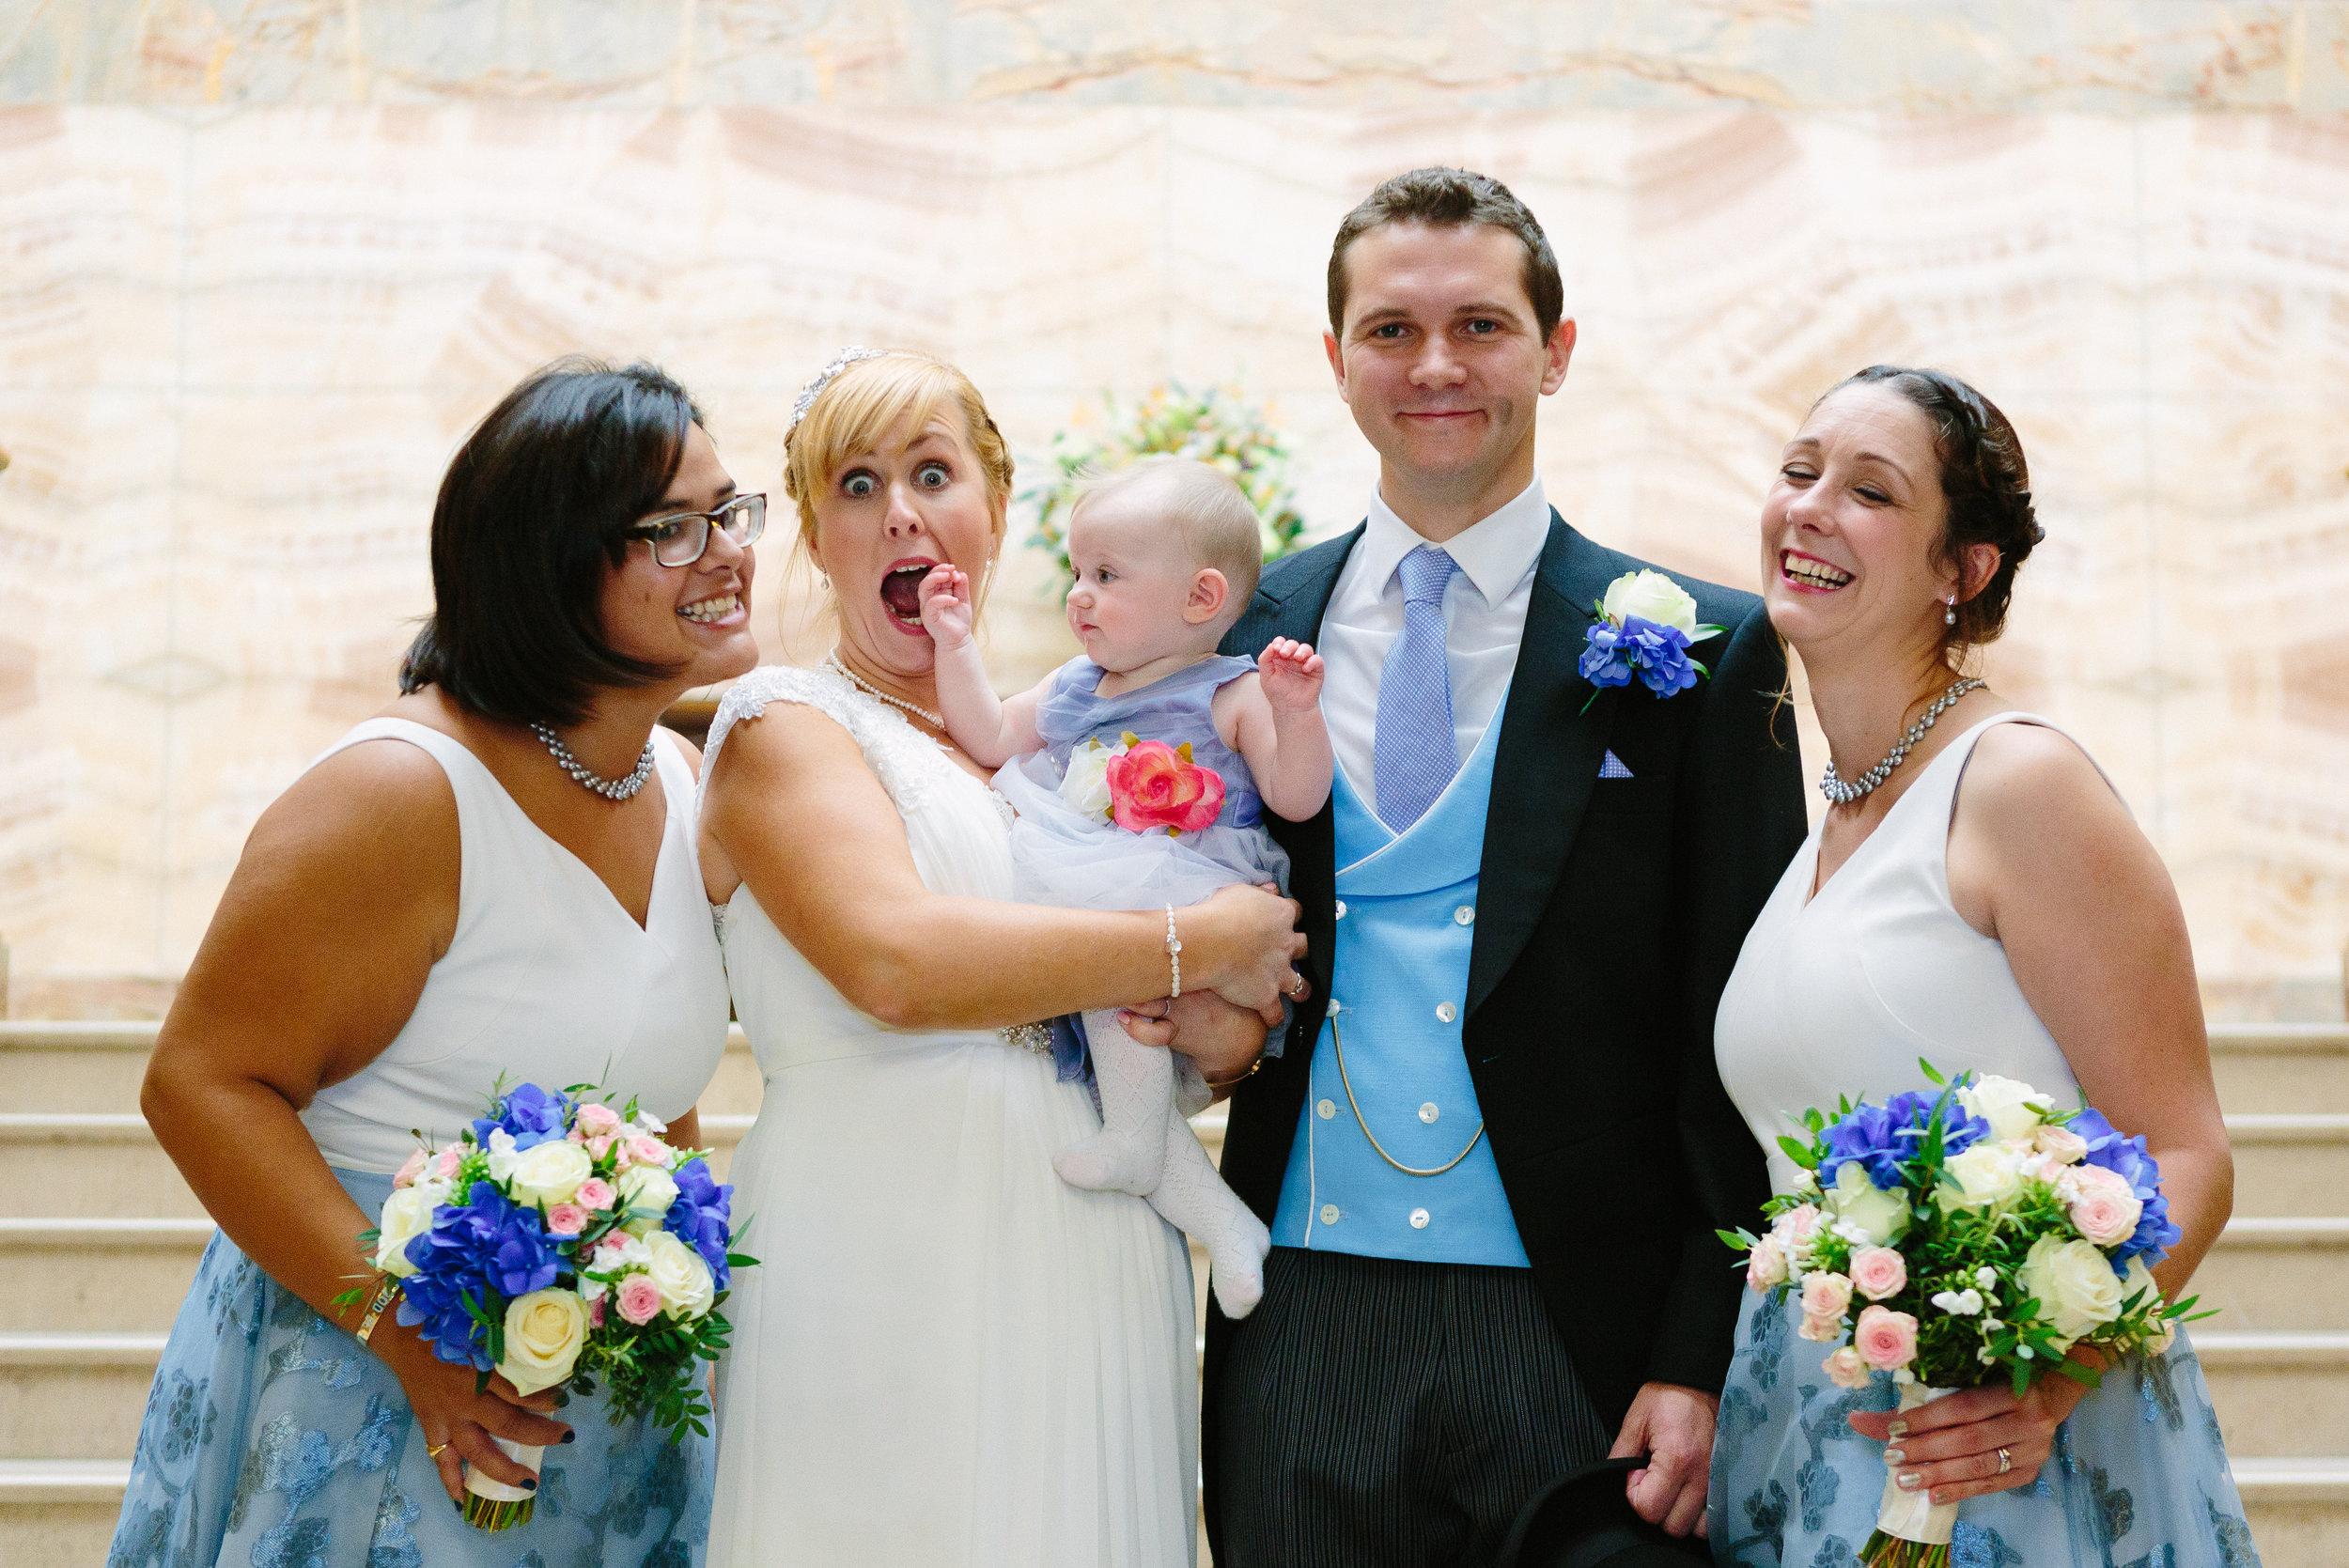 london-wedding-photography-wimbledon-wandsworth-town-hall-savoy-hotel-group-portrait-50